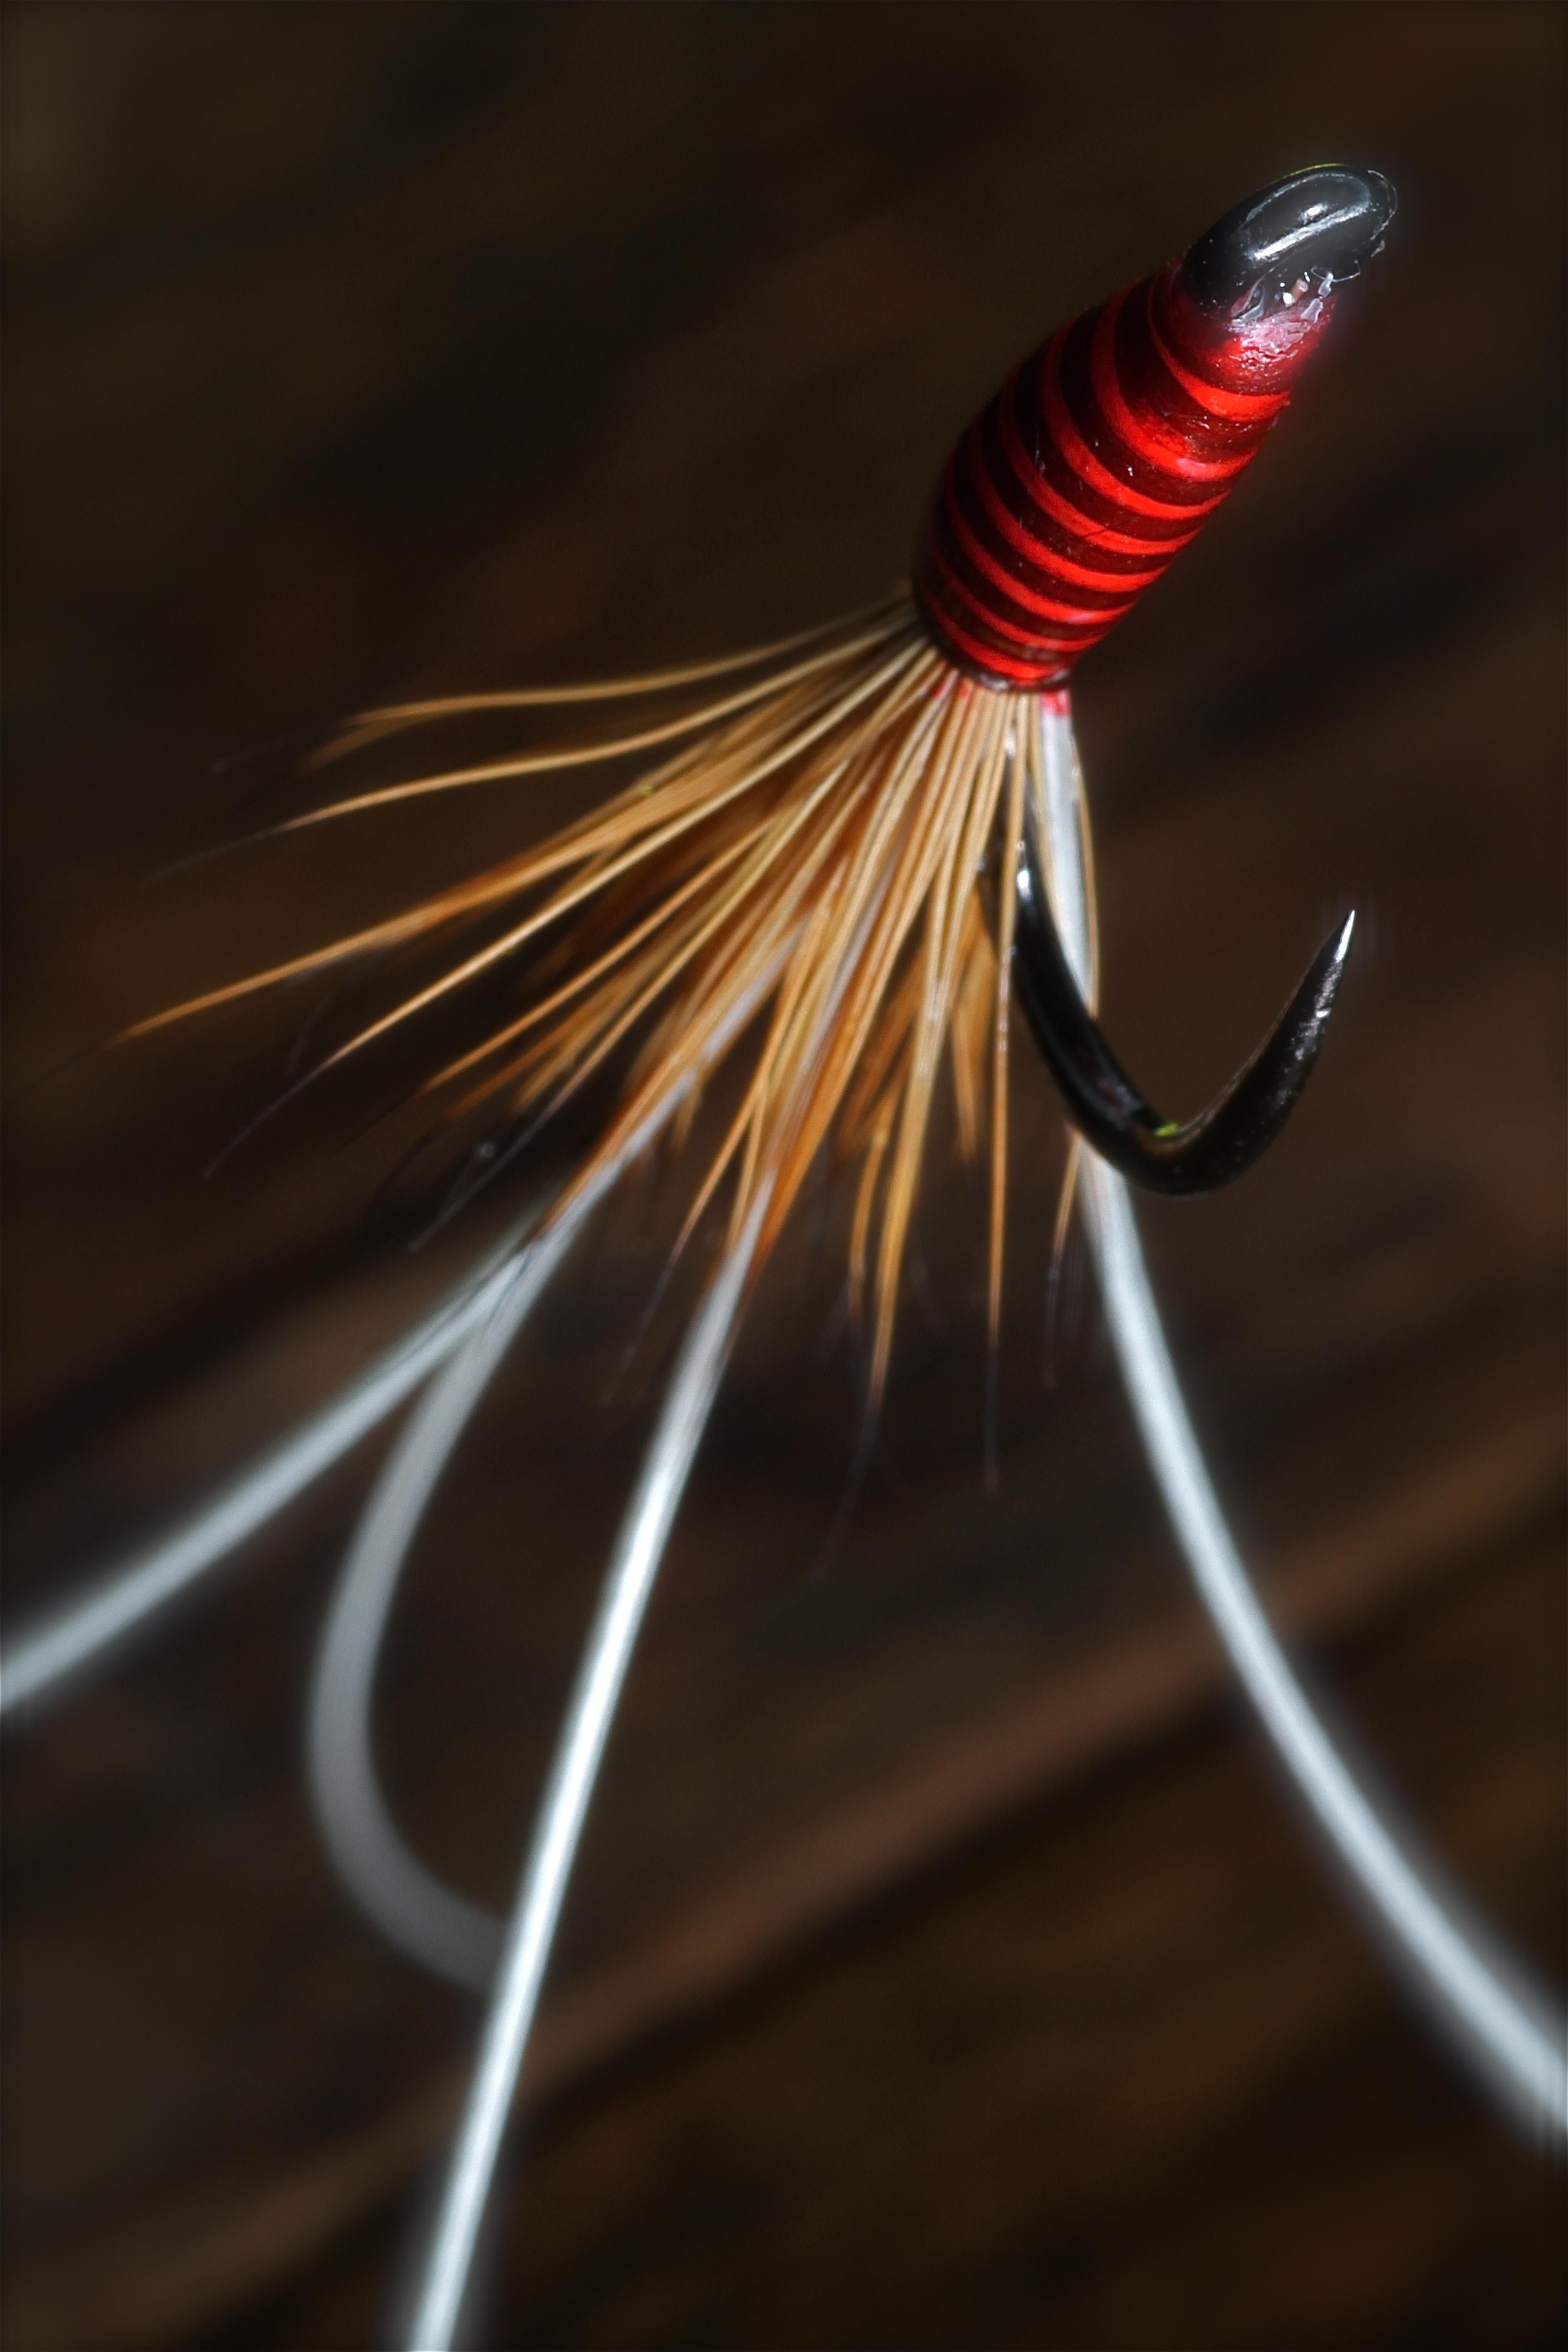 propen streamer sea trout fly fishing